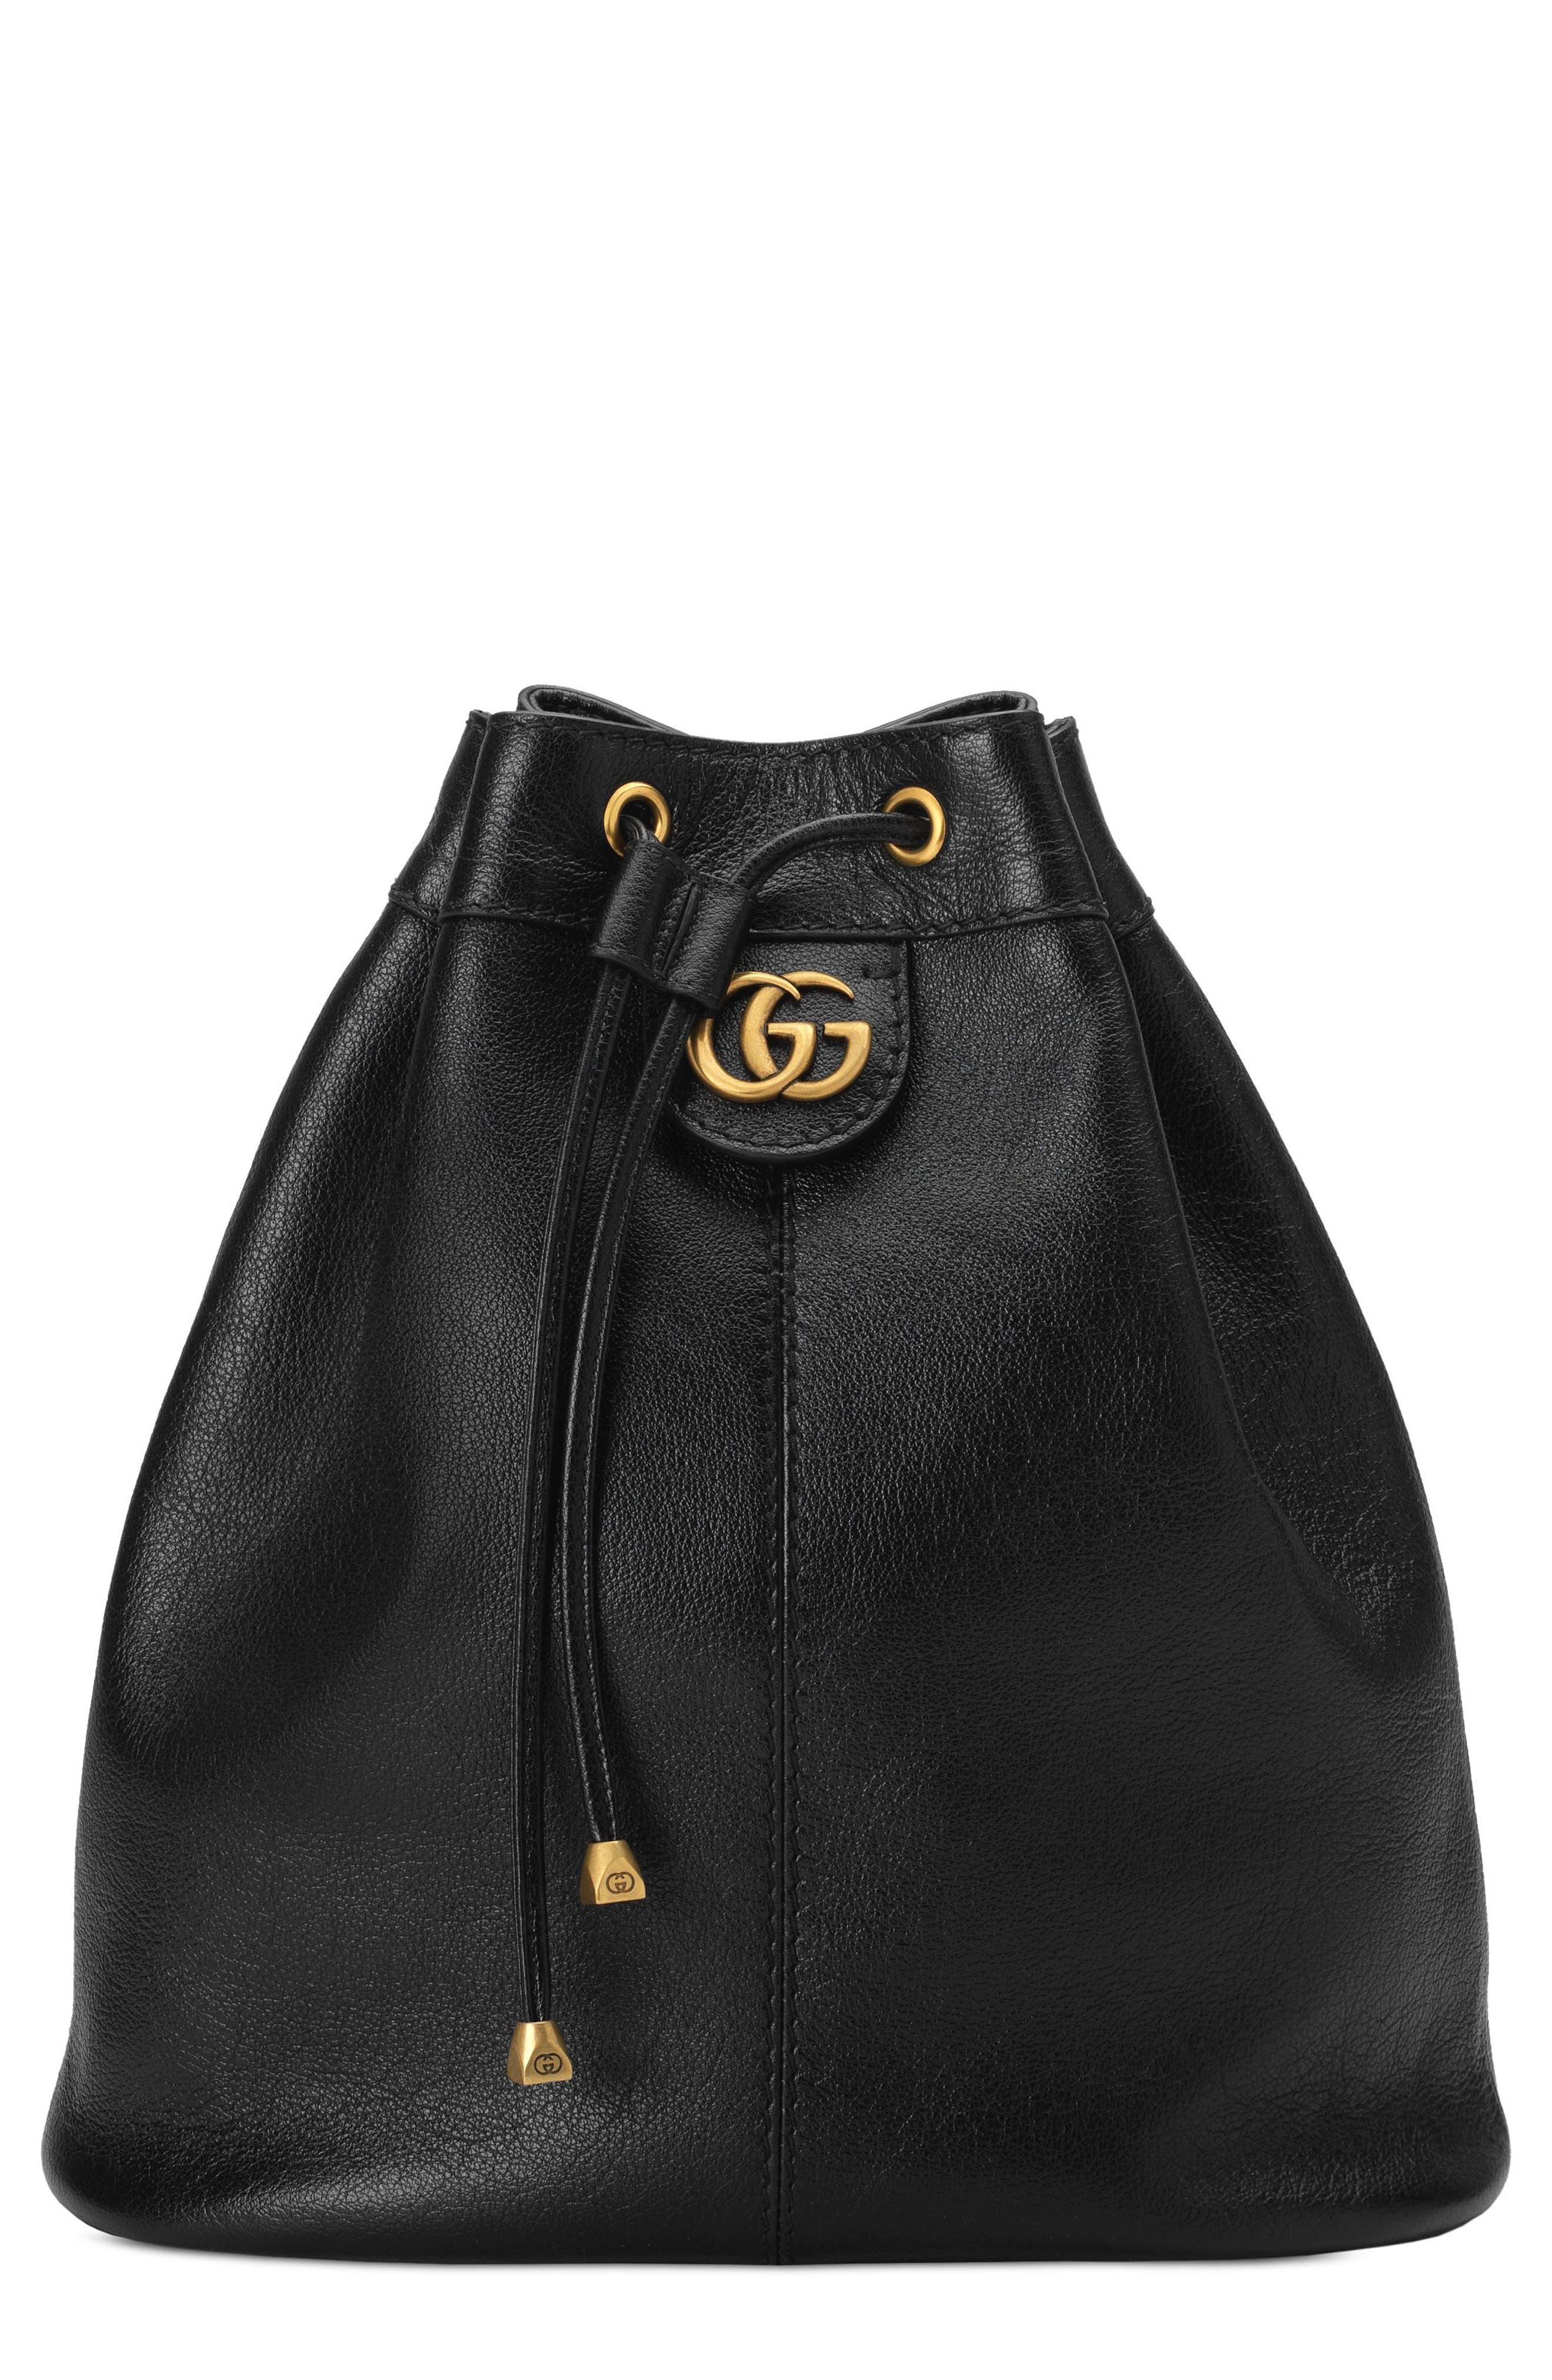 Medium RE(BELLE) Leather Convertible Bucket Bag,                             Main thumbnail 1, color,                             001